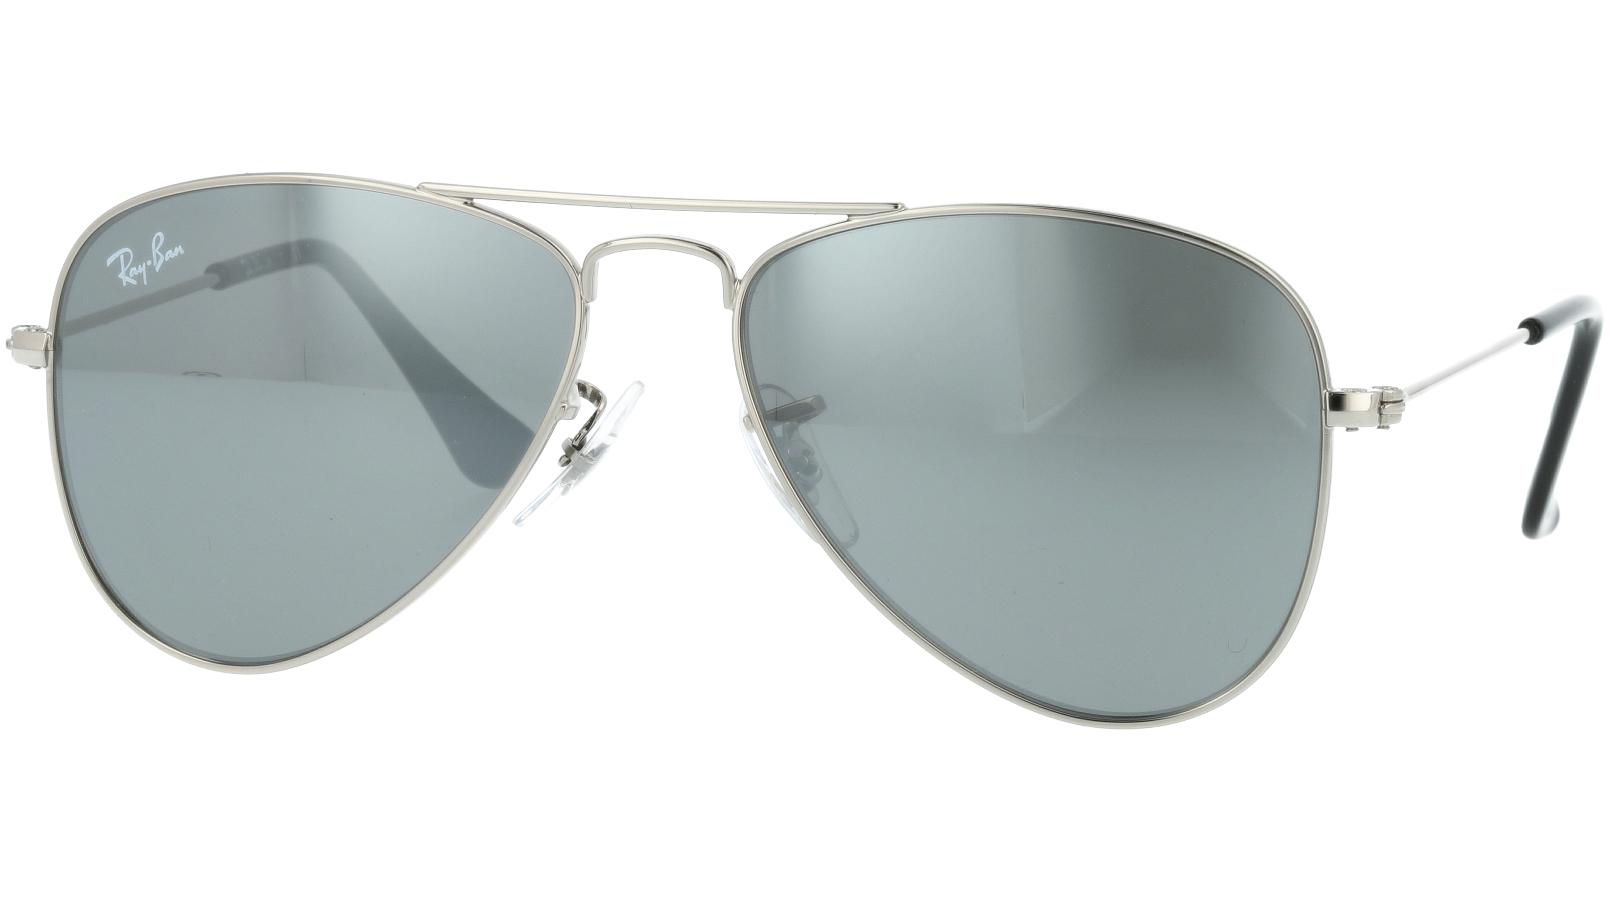 RAYBAN RJ9506S 212/6G 50 SILVER Sunglasses